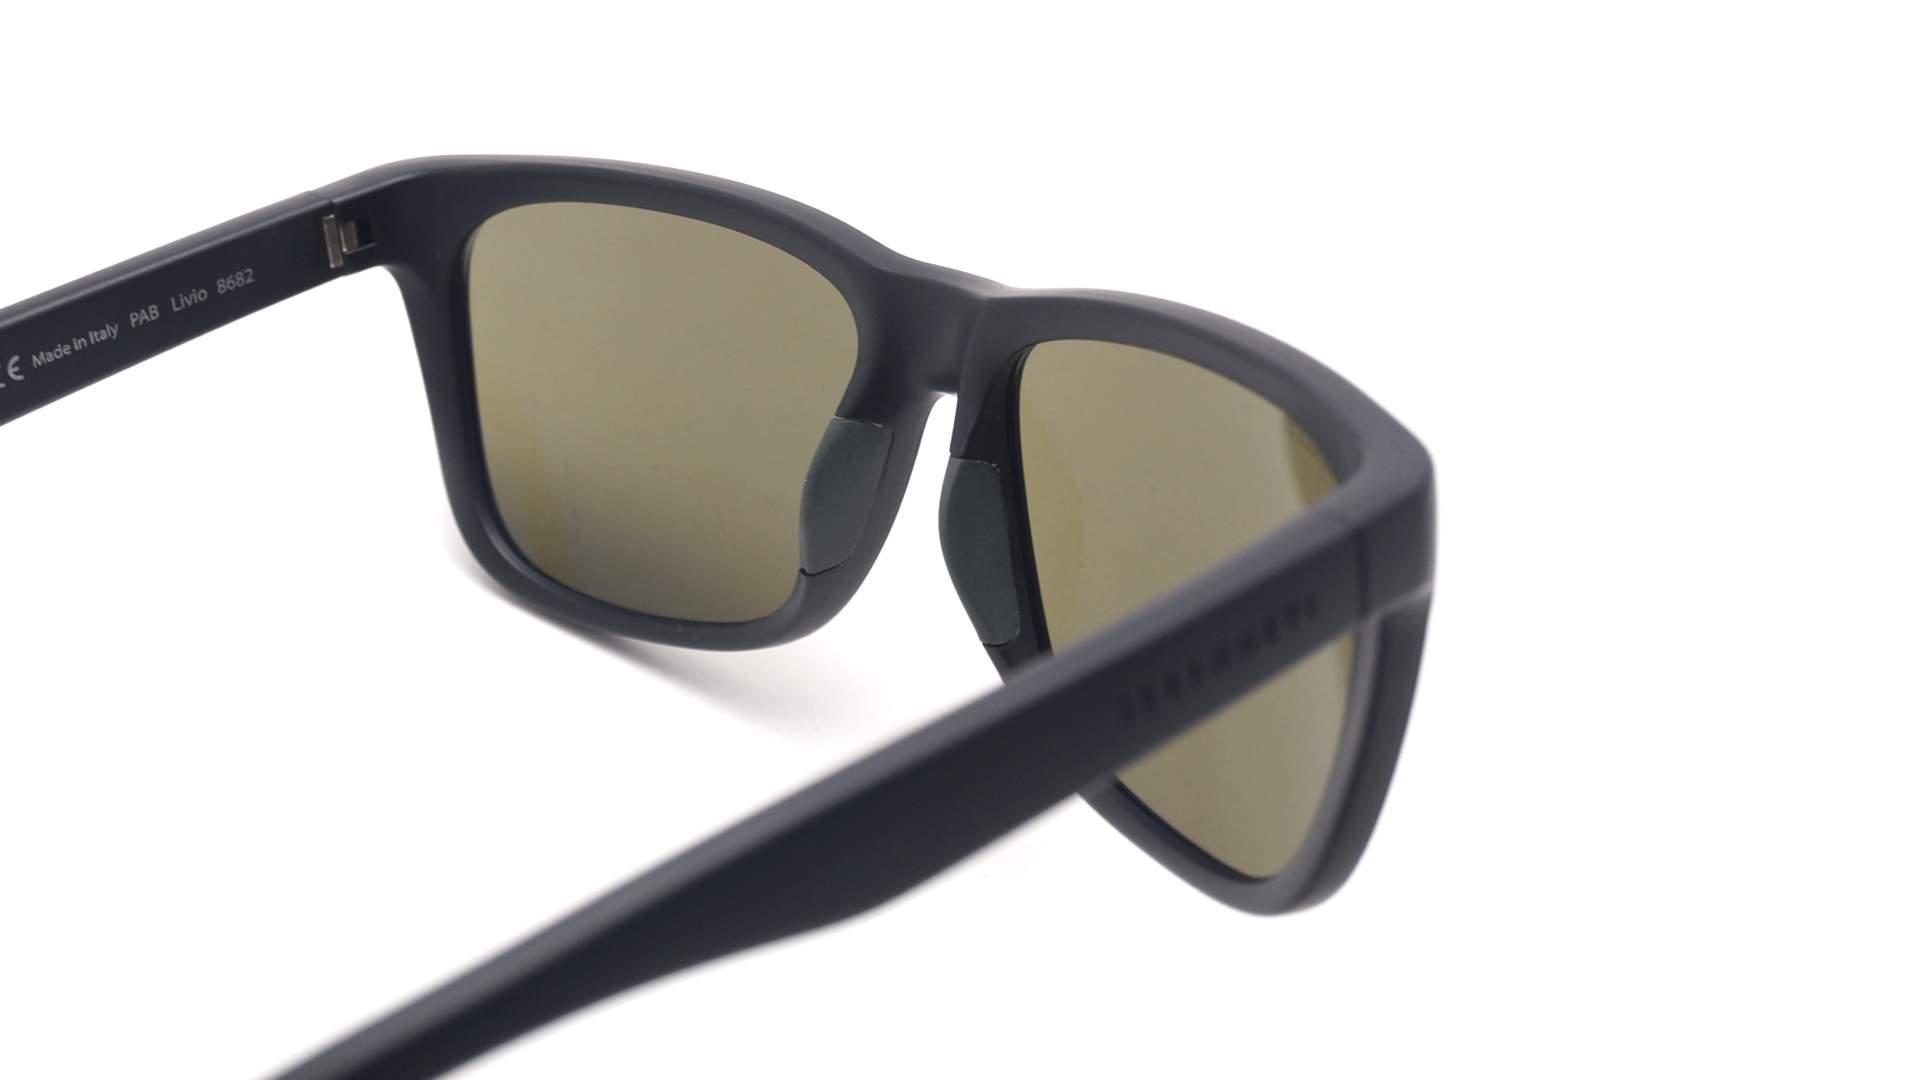 5637a736f1ae Sunglasses Serengeti Livio Black Matte 8682 57-15 Large Polarized  Photochromic